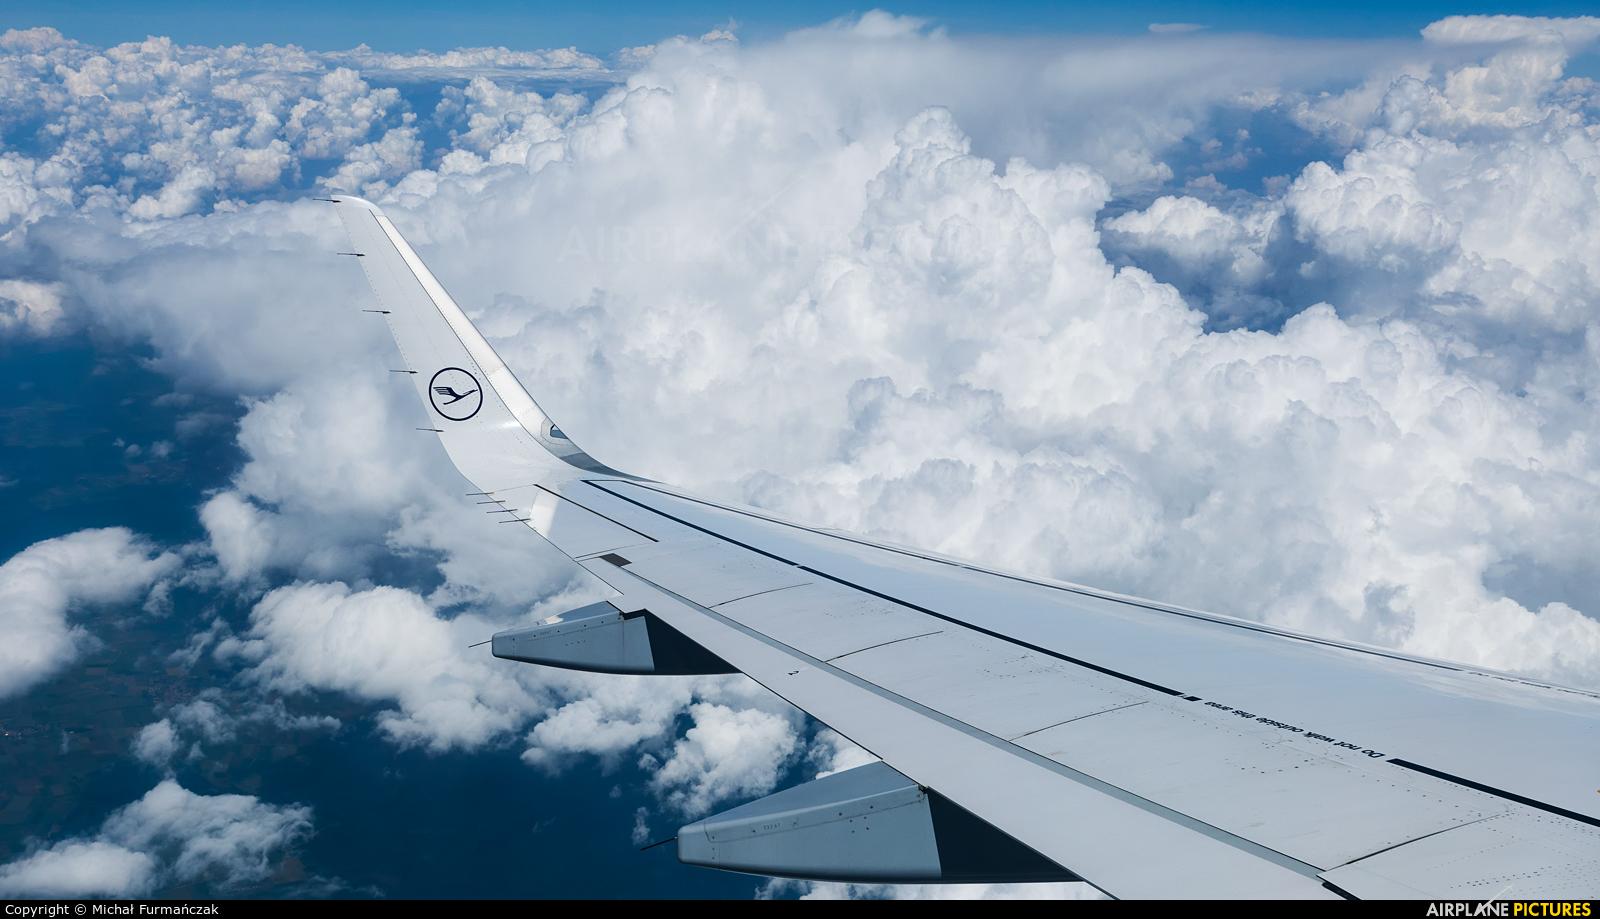 Lufthansa D-AIUJ aircraft at In Flight - International